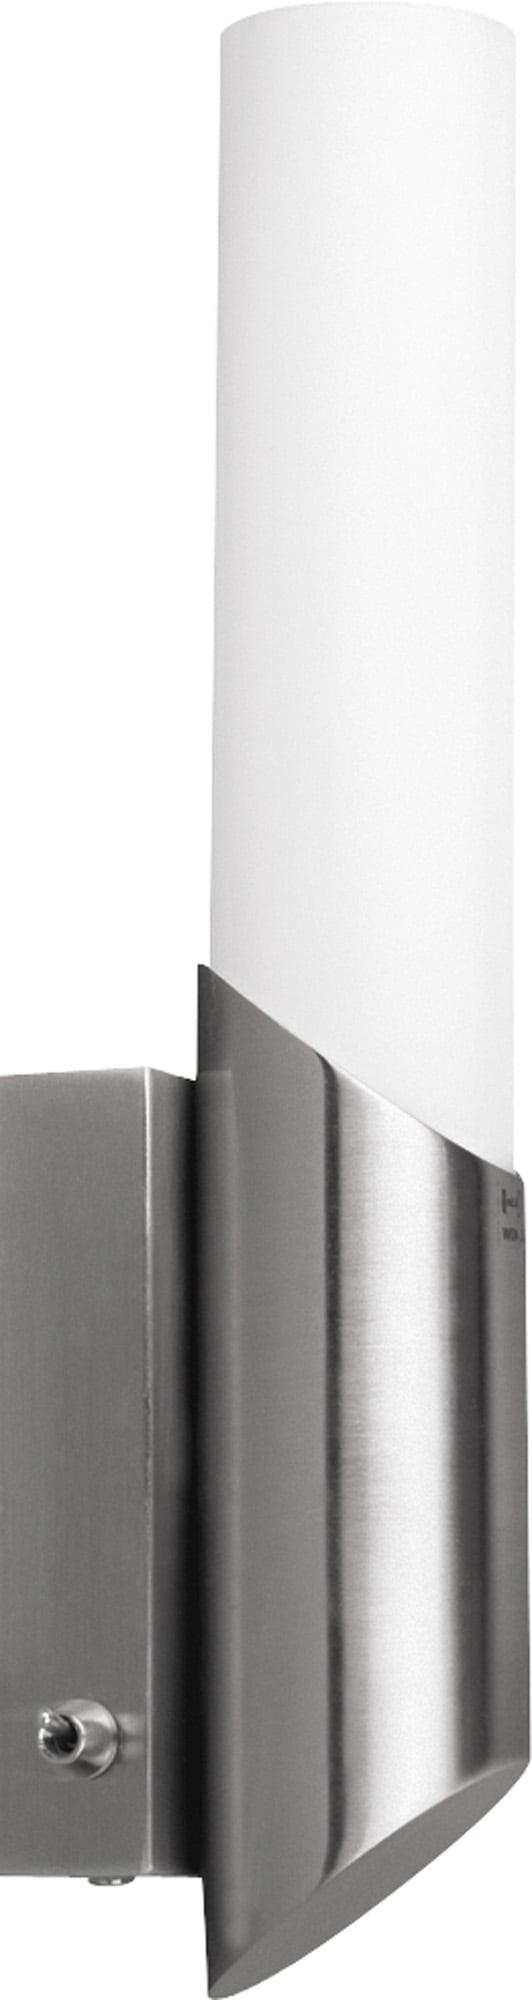 Saténová nástěnná lampa Aquatic satin / white E14 40W